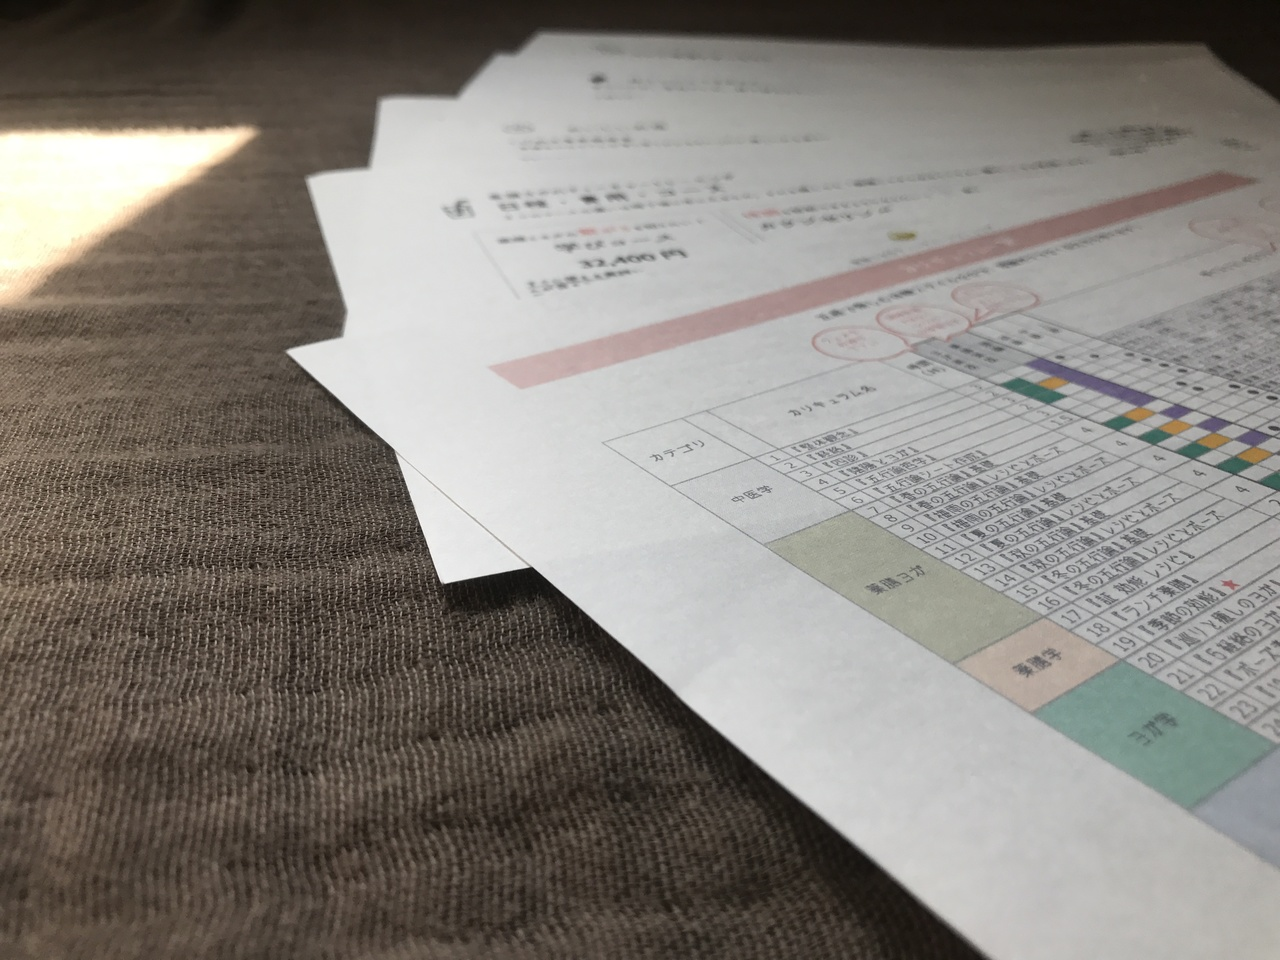 TT「中医学 五行論シート作成」(旧:中医学 薬膳ヨガ基礎五行論)